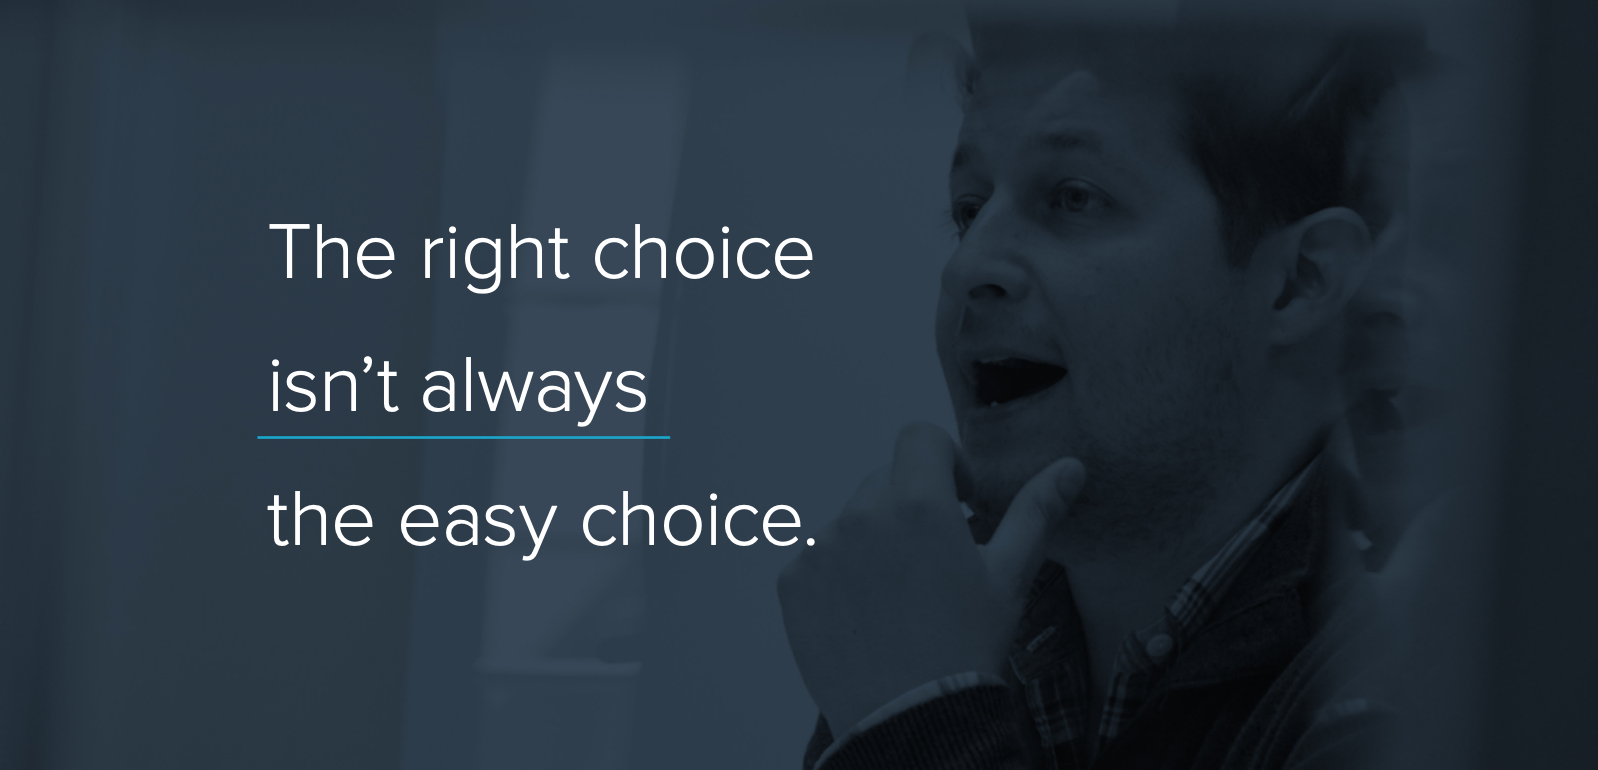 The Right Choice isn't always the easy choice